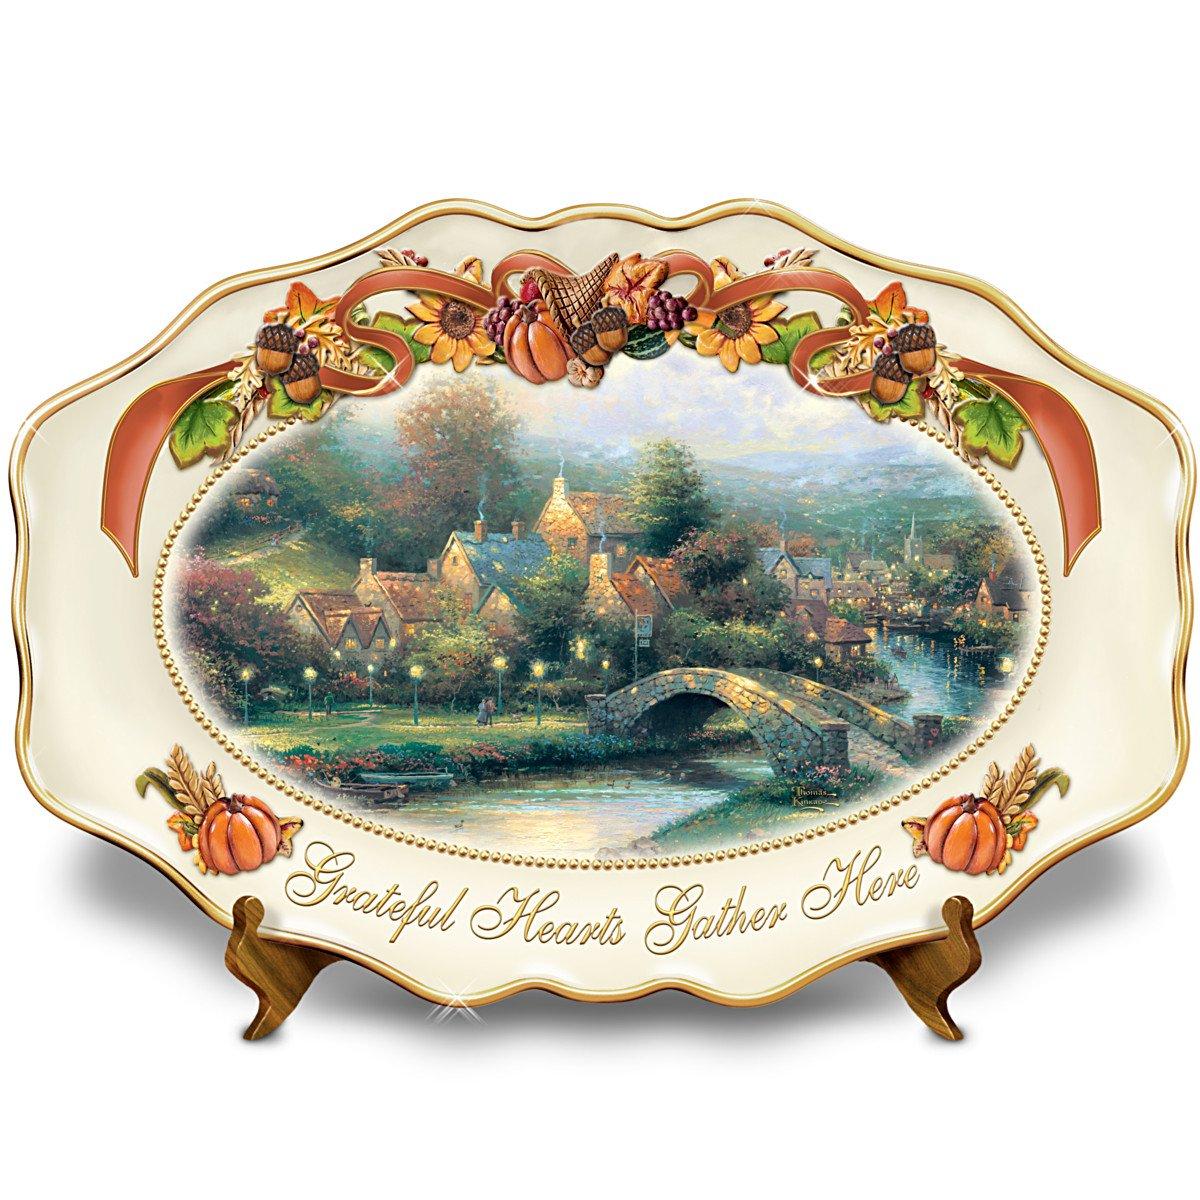 Thomas Kinkade's Lamplight Village Grateful Hearts Gather Here Thanksgiving Art Platter by The Bradford Exchange